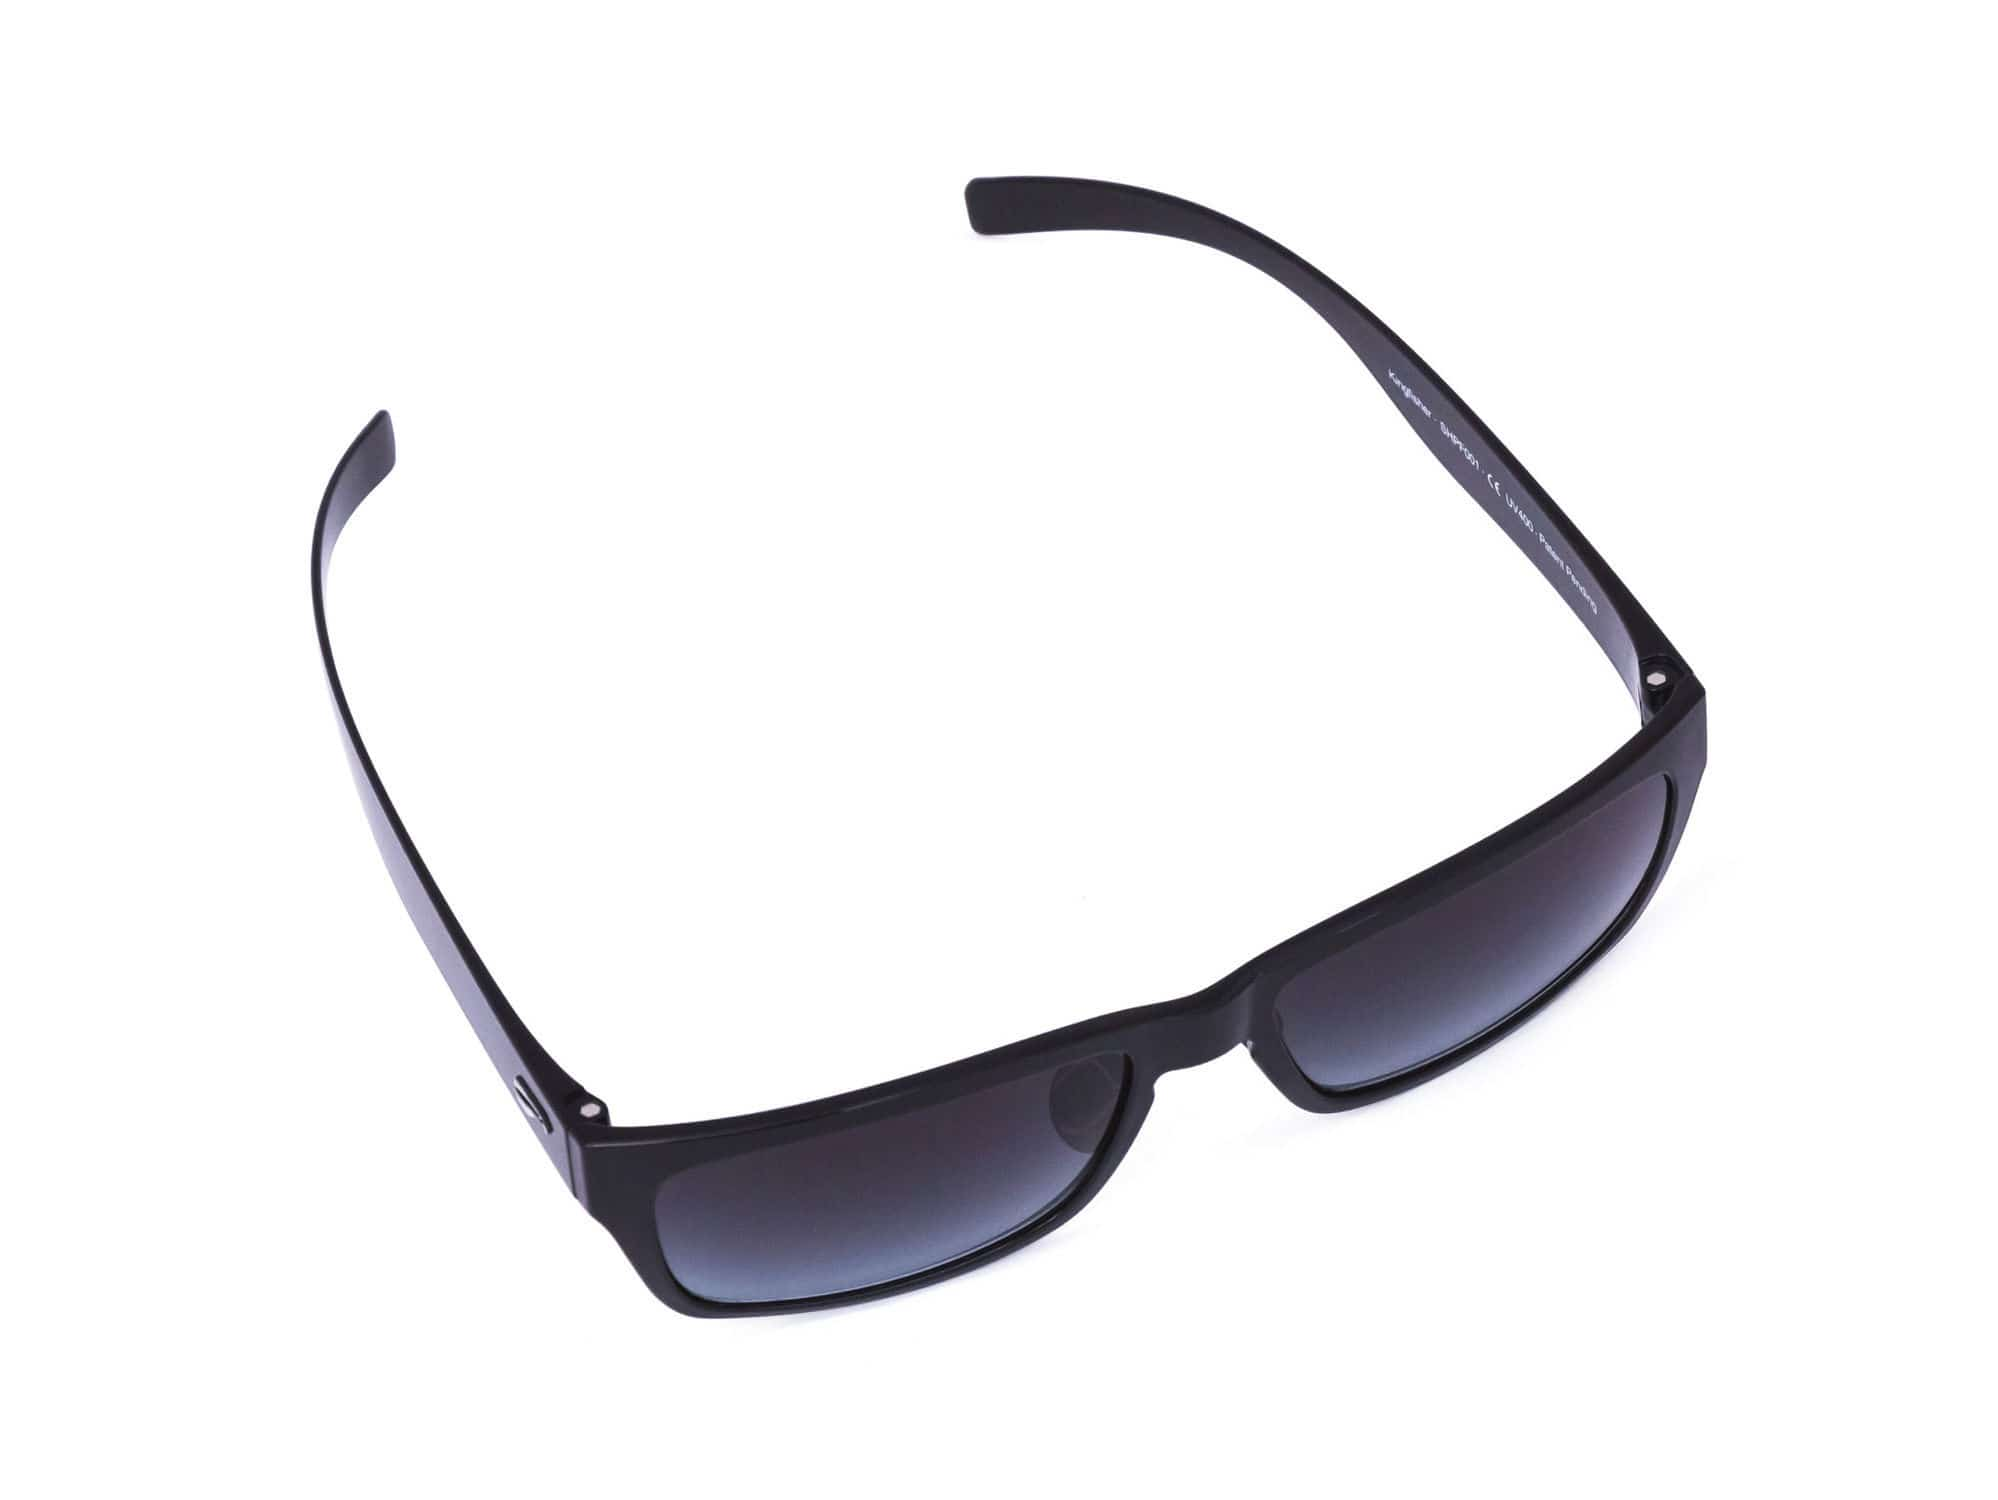 ... gafa para piloto   de sol   con lentes polarizadas   graduada ... a8f4d019c0